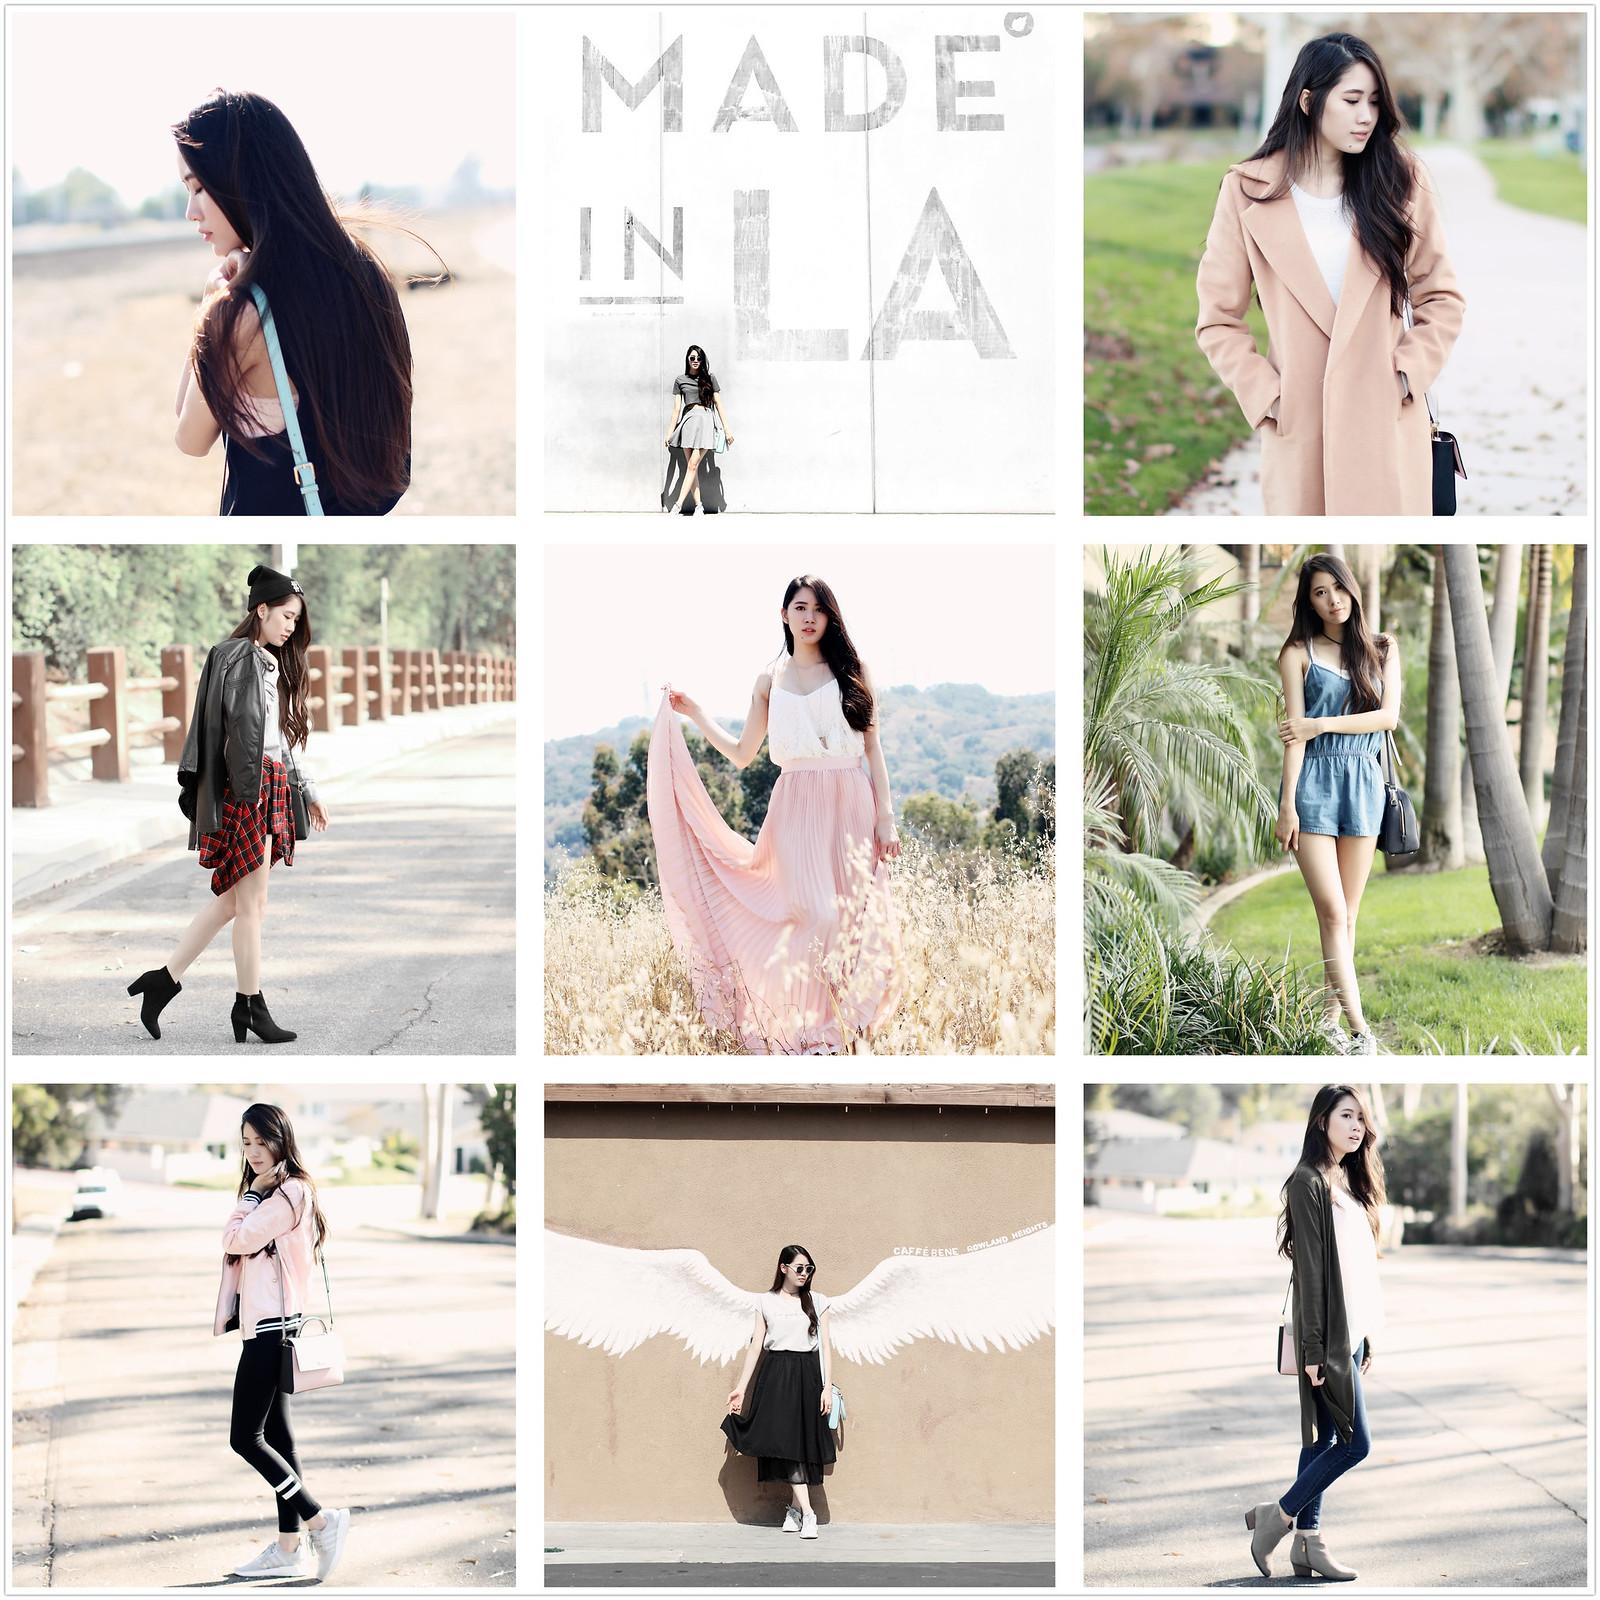 fashion-ootd-style-personalstyle-clothestoyouuu-elizabeeetht-lifestyle